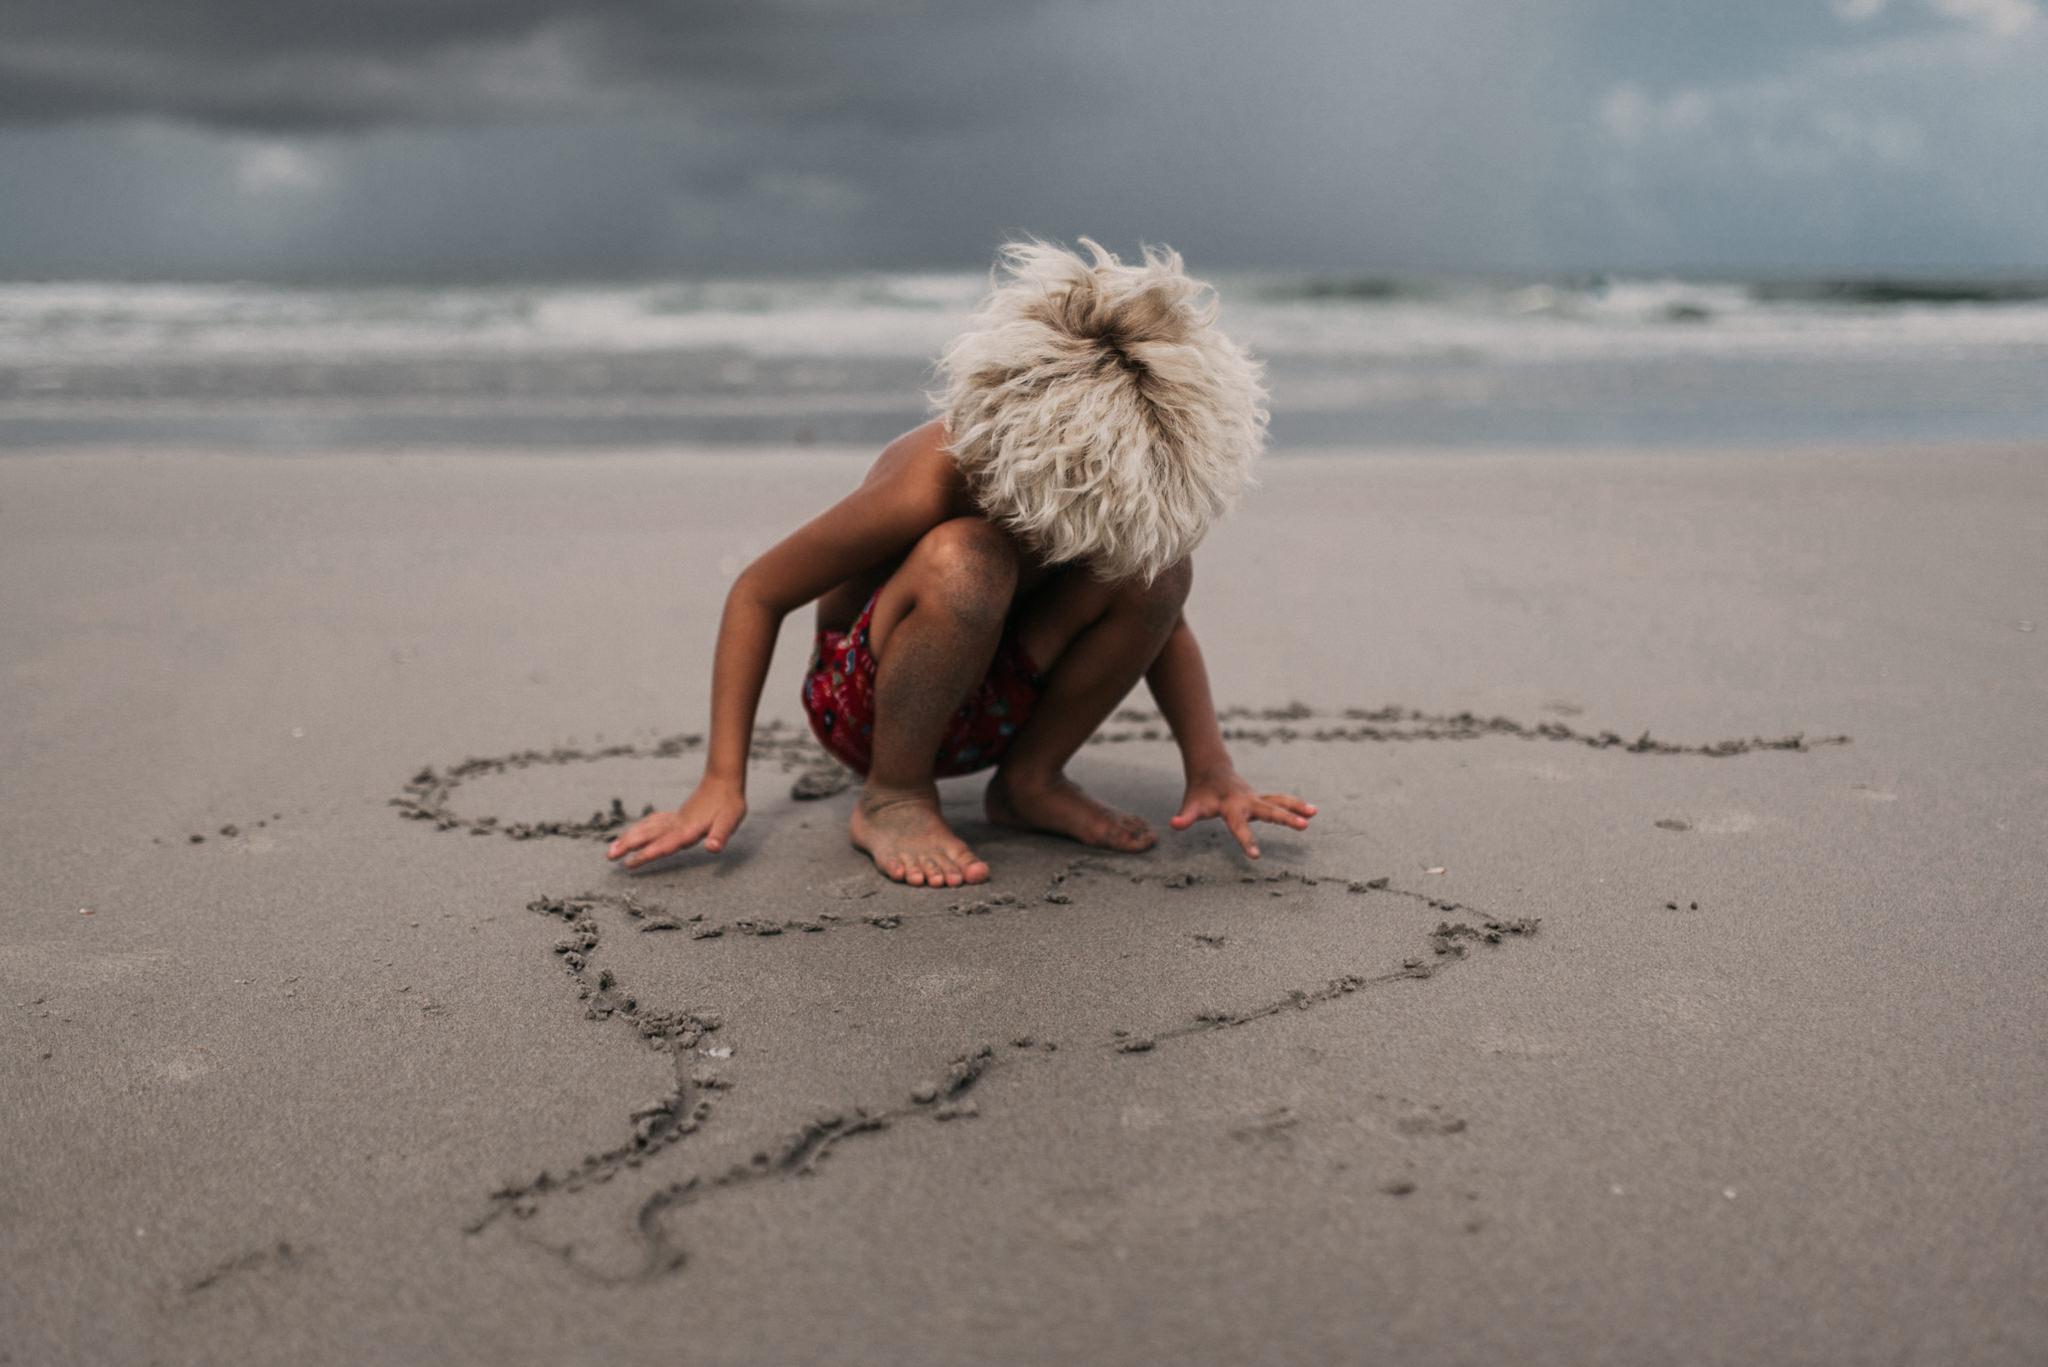 twyla jones photography - treasure coast florida - stormy beach boy playing in sand--22.jpg